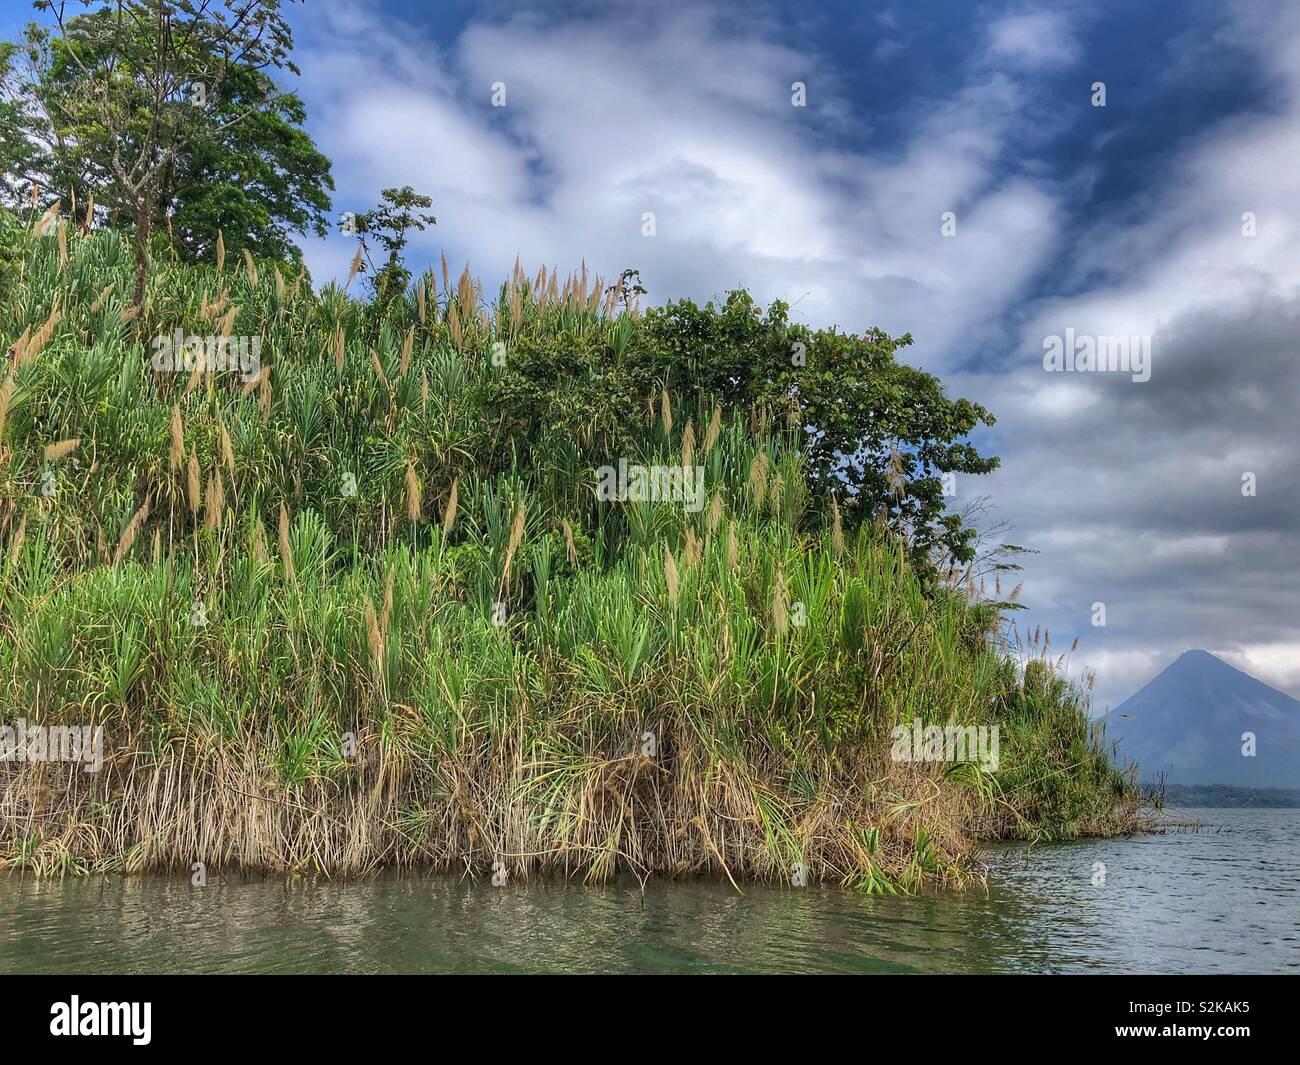 Lake Arenal in Costa Rica. - Stock Image